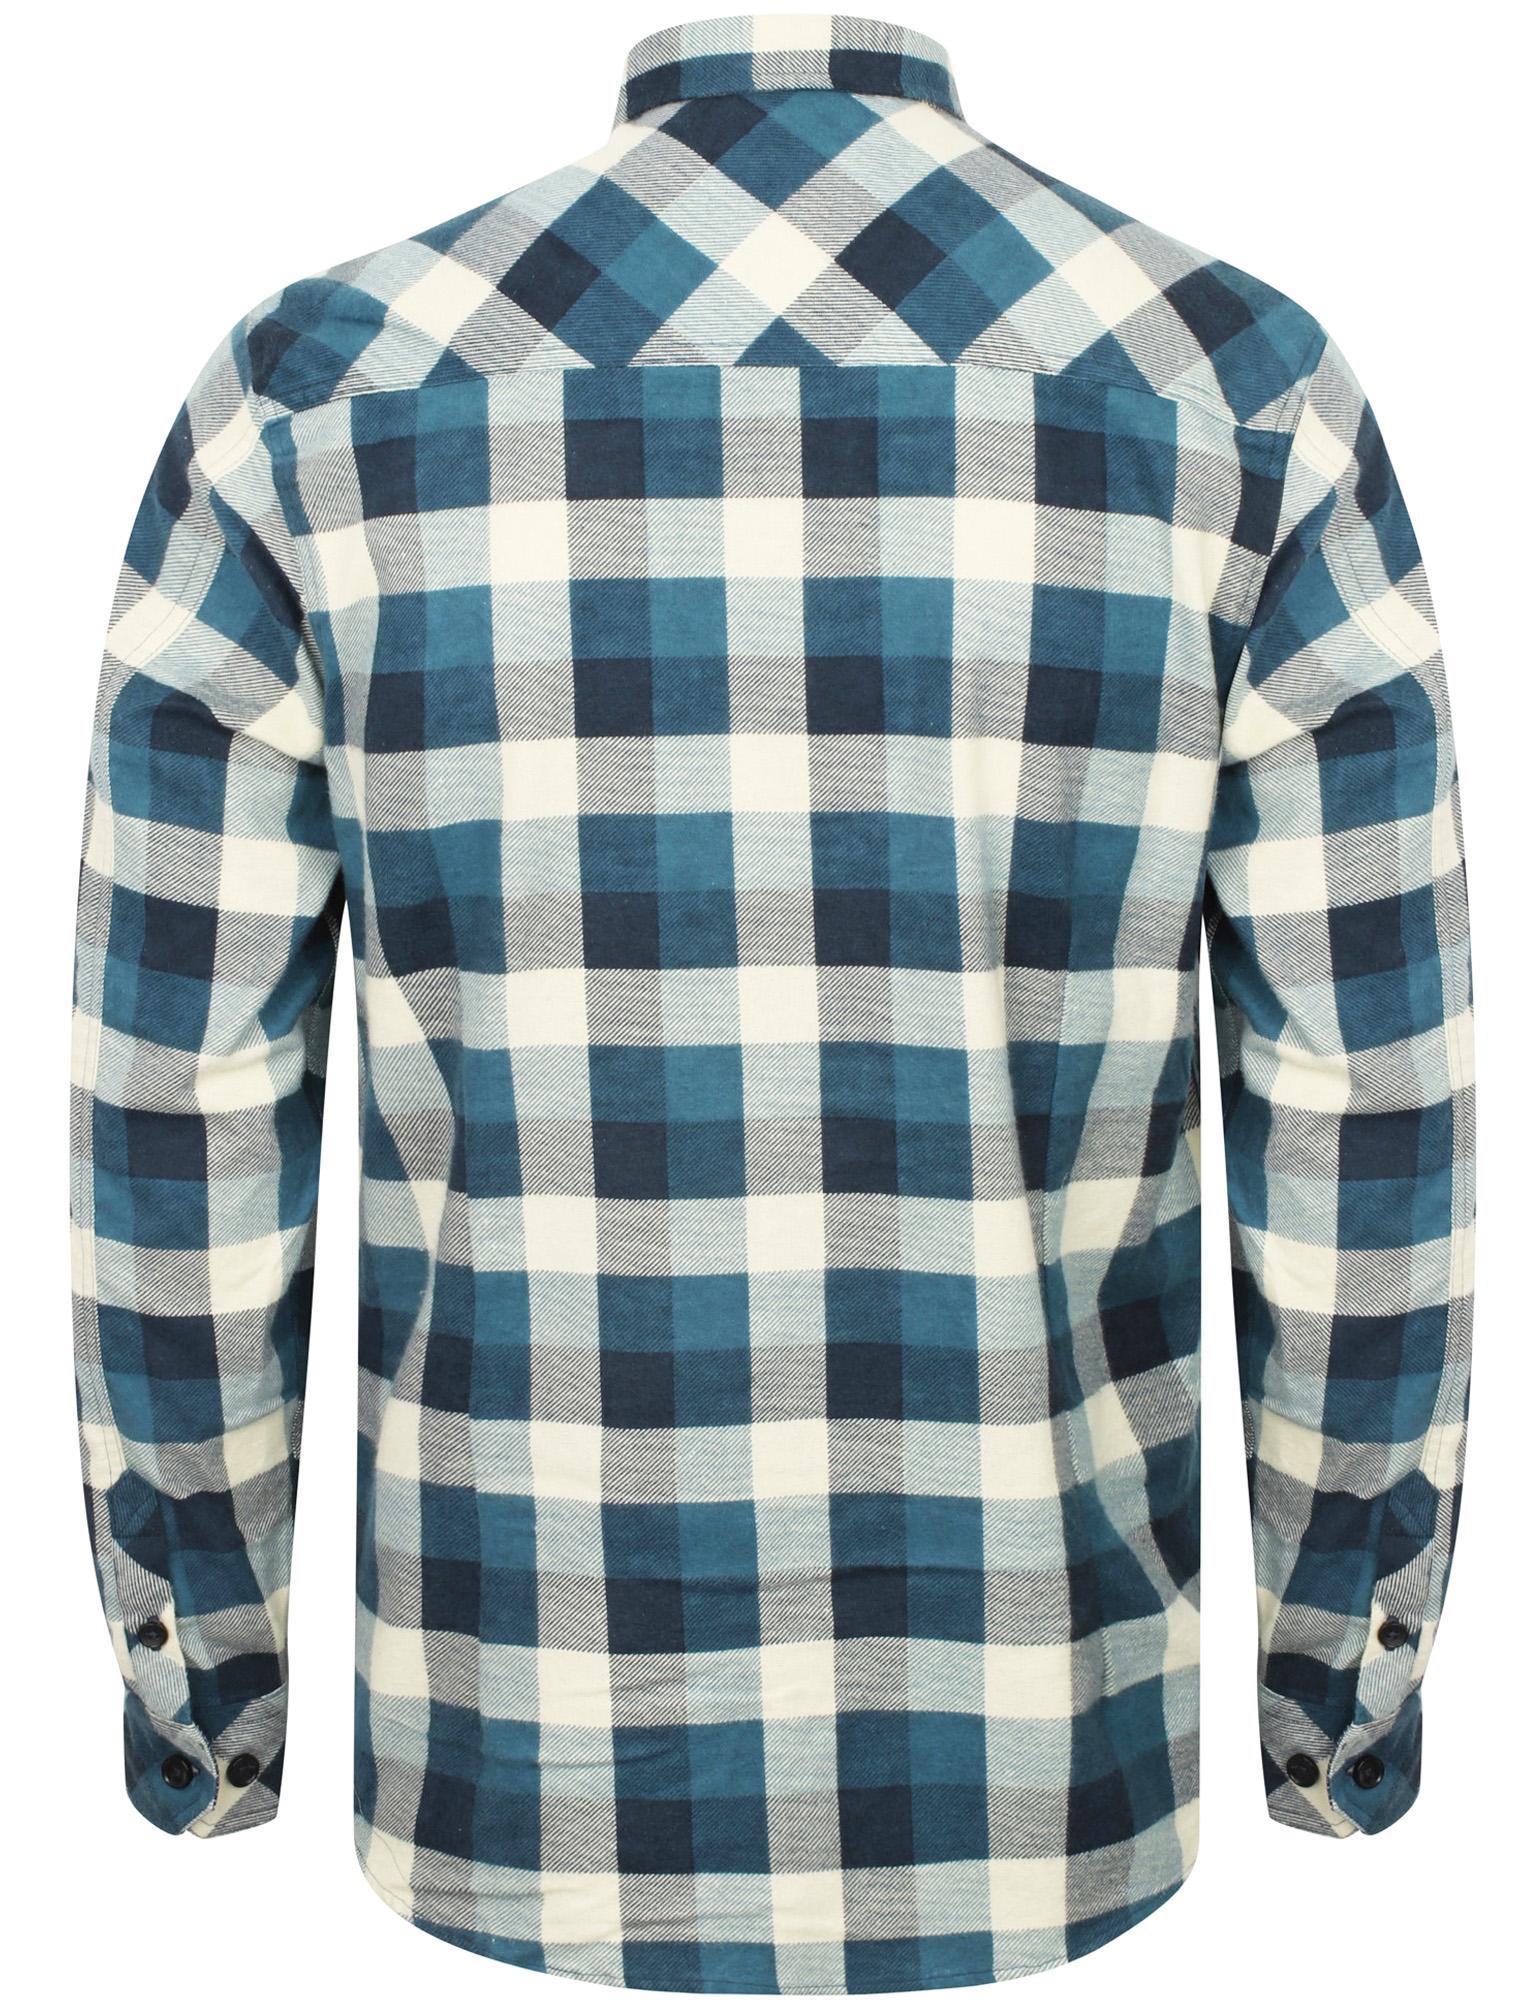 1deb99e7c7 Mens Tokyo Laundry Branded Cotton Rich Long Sleeve Checked Shirt ...